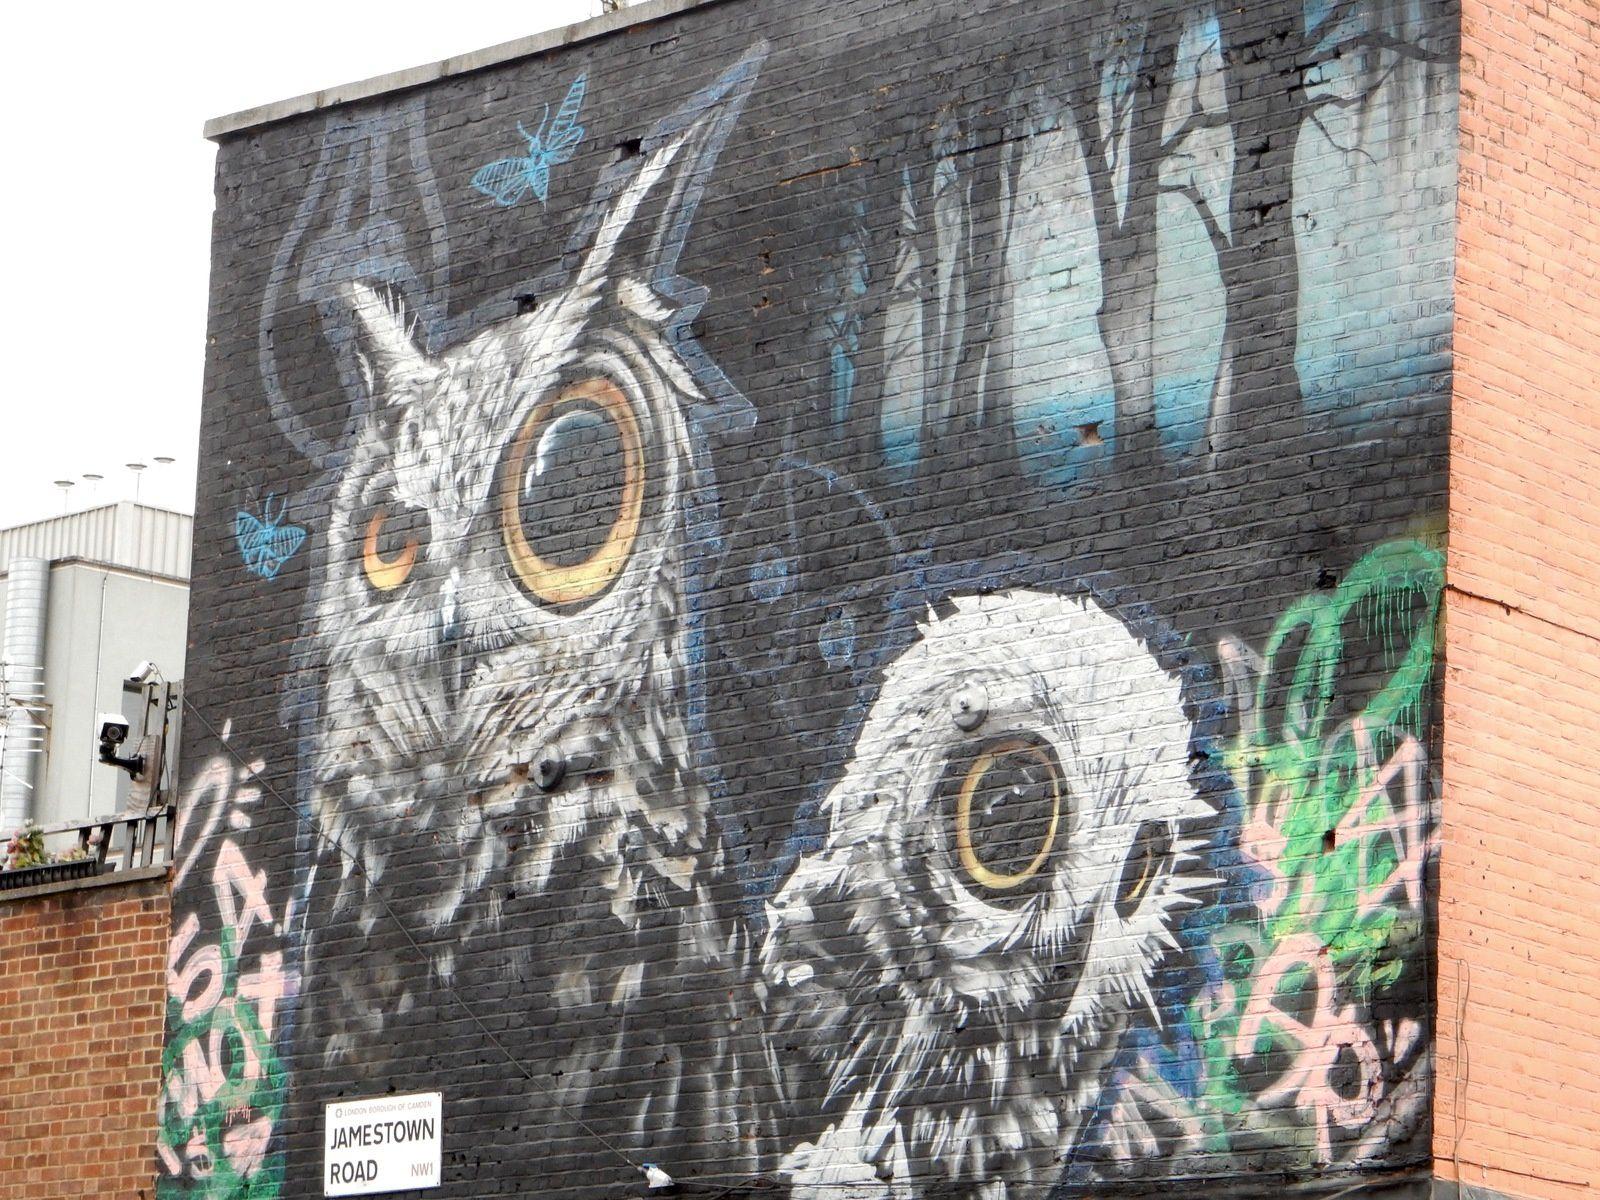 Londres, la rue - Juillet 2016